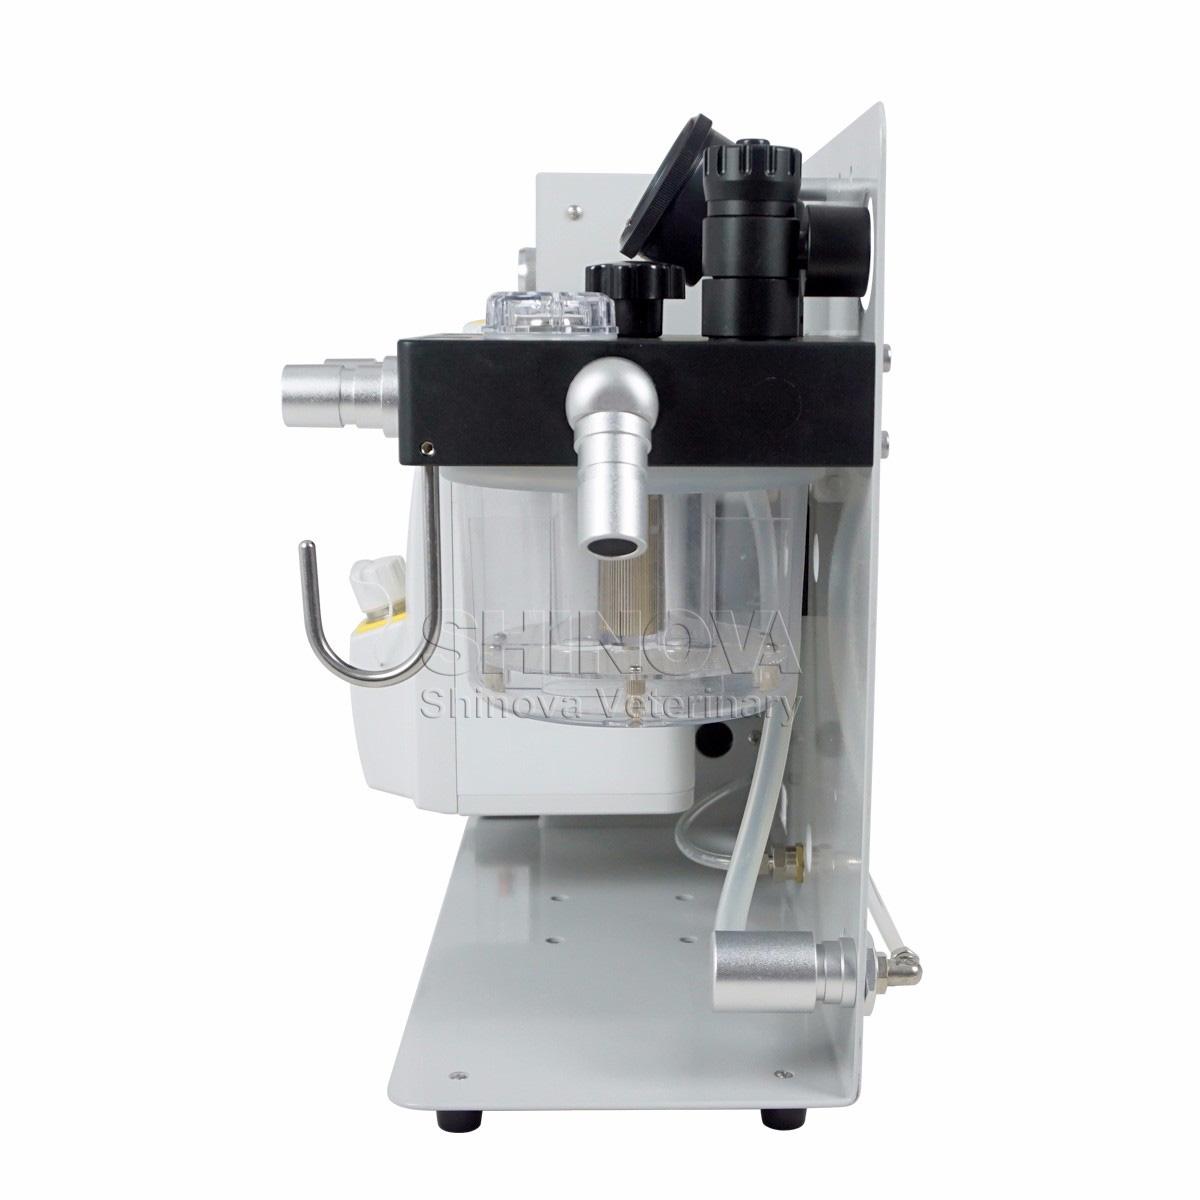 Portable Anesthesia Unit Shinova Vet